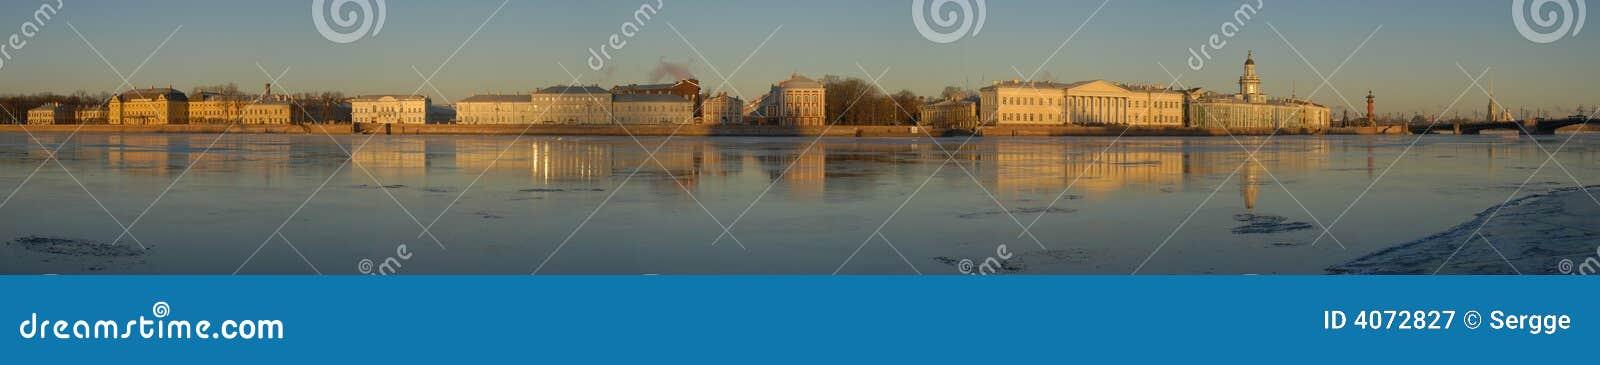 St Petersburg. Panorama bonito